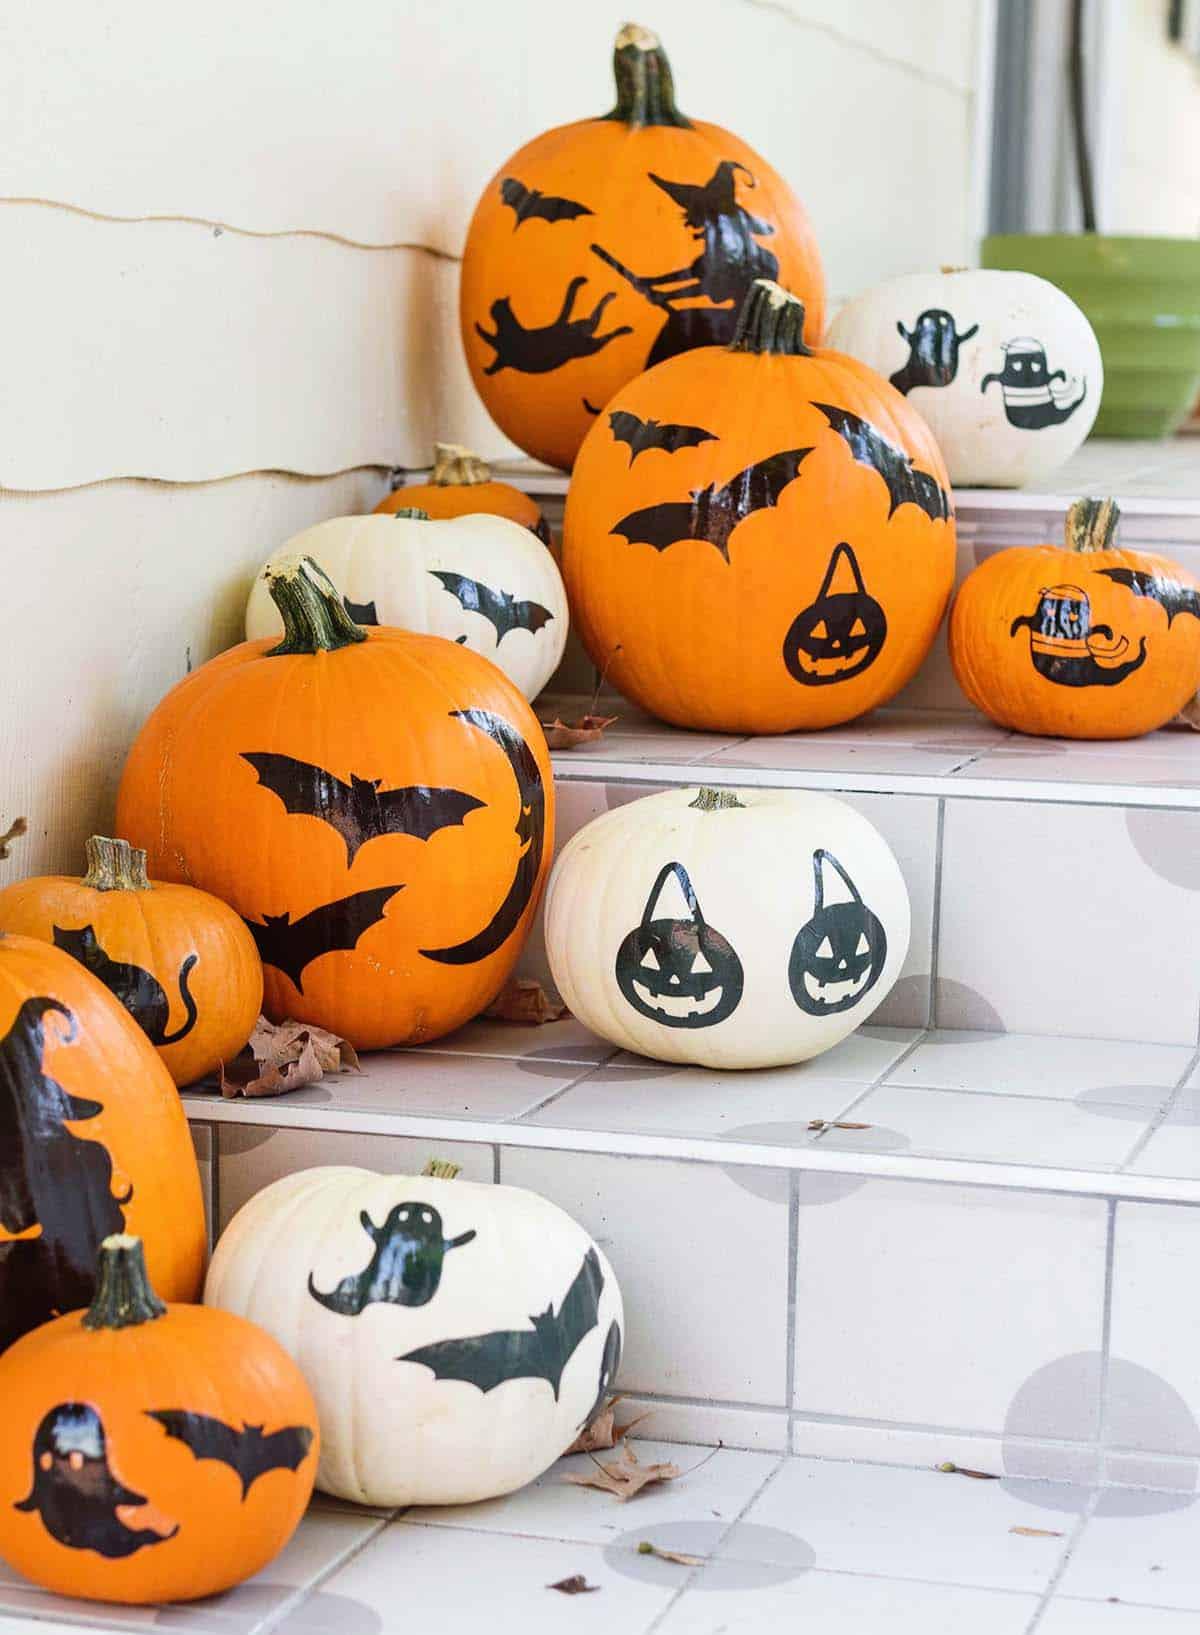 Pumpkins with spooky designs